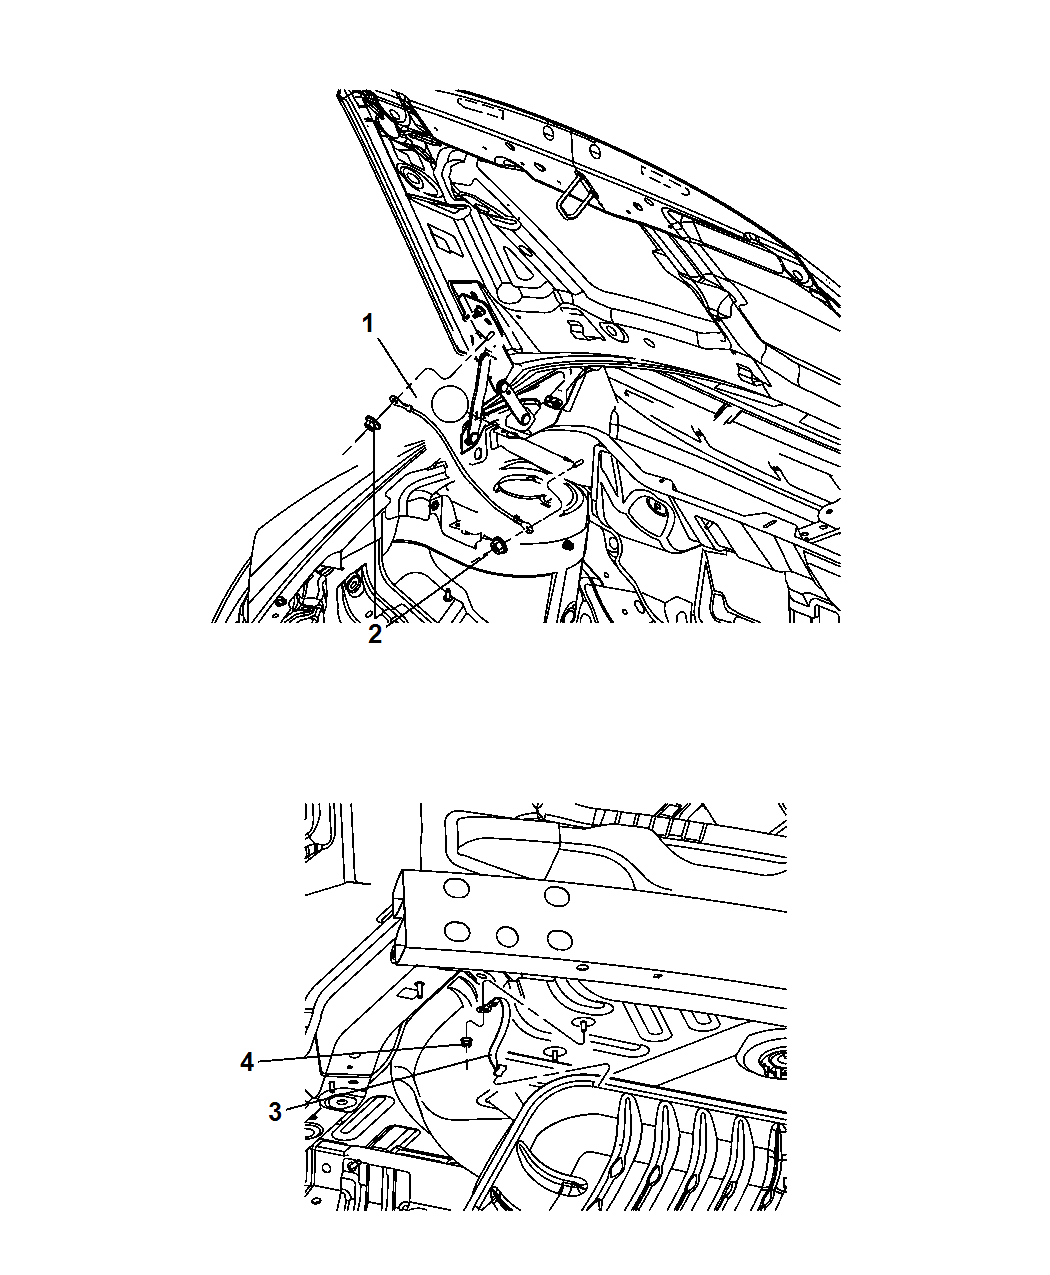 [EQHS_1162]  RS_2543] 2007 Dodge Caliber Engine Mounts Diagram Schematic Wiring | 2007 Dodge Caliber 20 Without A C Engine Diagram |  | Lukep Pala Leona Ntnes Mohammedshrine Librar Wiring 101